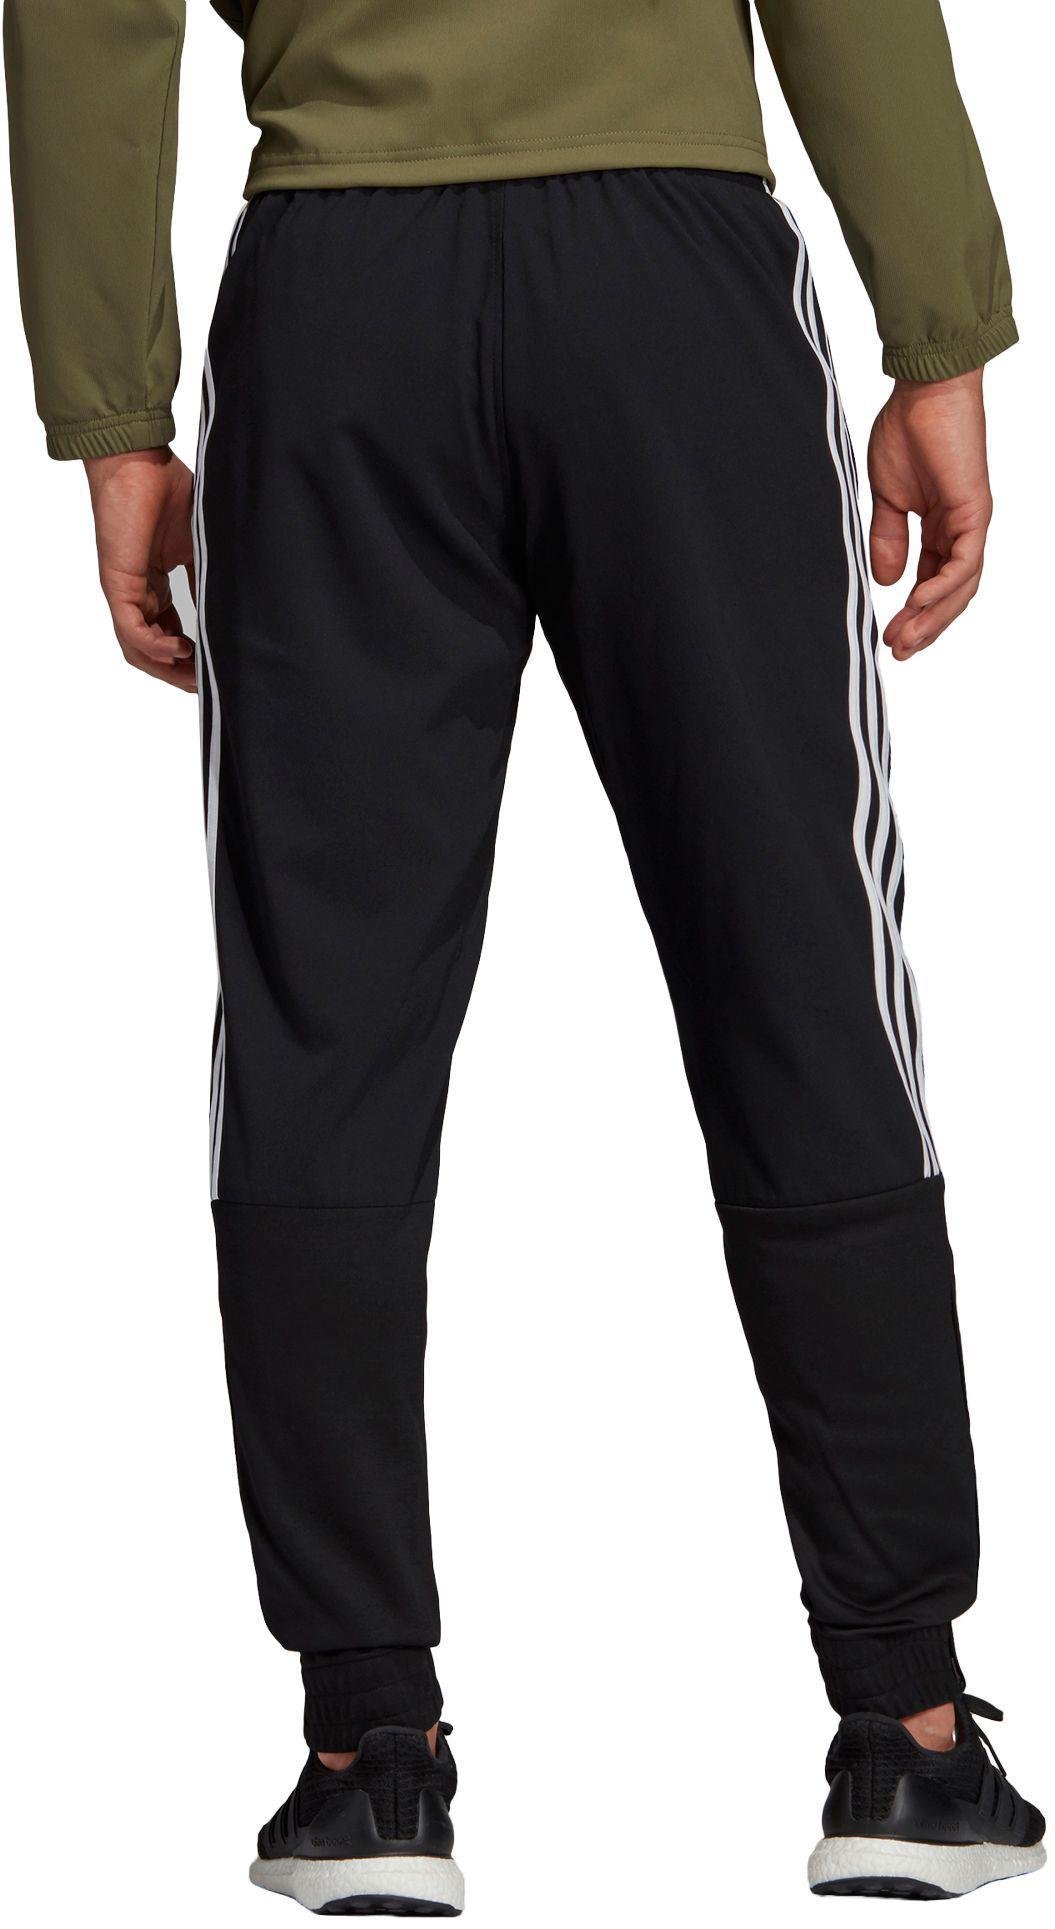 f7bb99f2 adidas Sport Id Tiro Woven Pants in Black for Men - Lyst